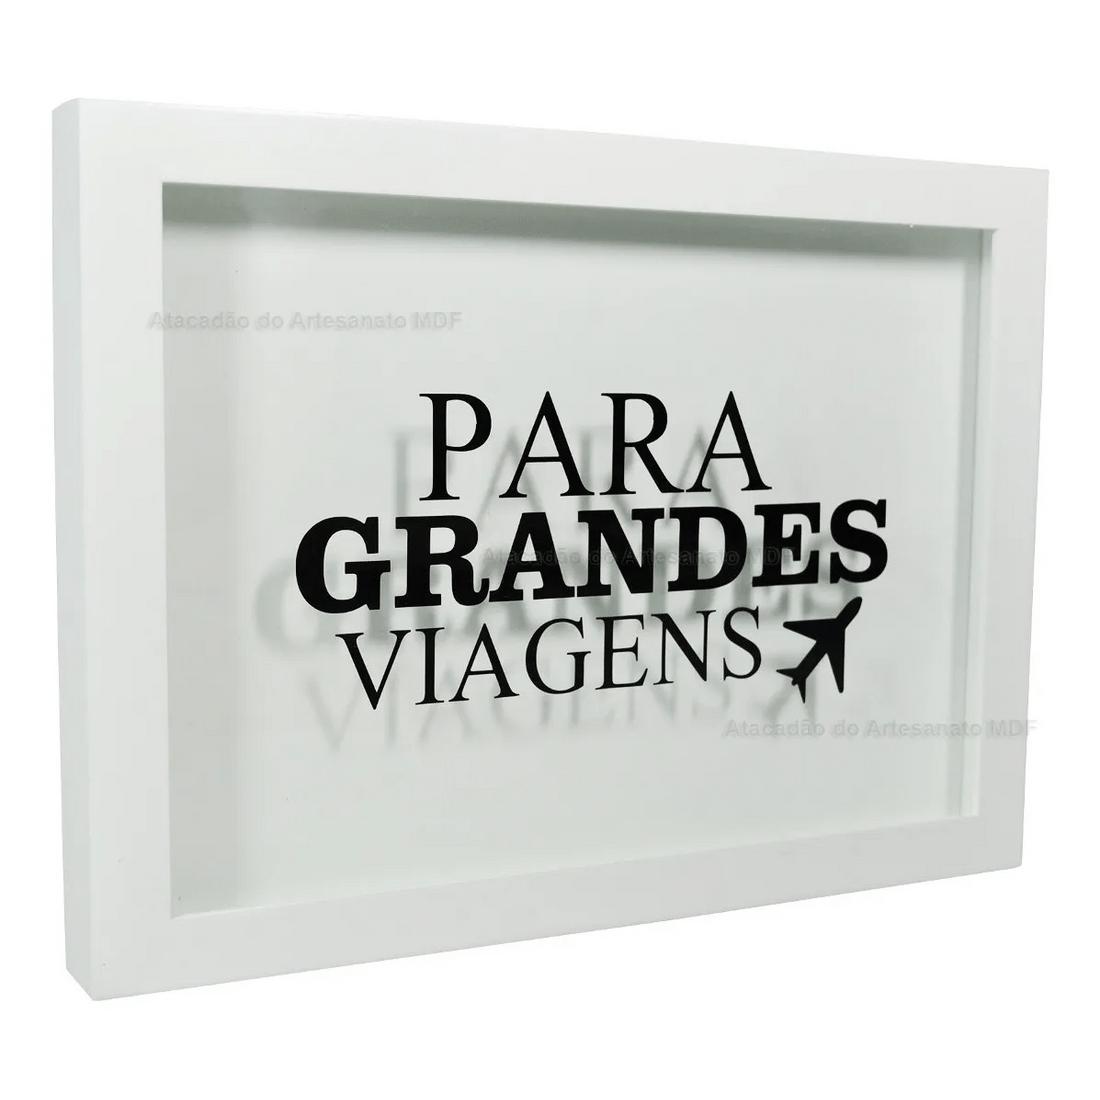 Quadro-Moeda-Para-Grandes-Viagens-C-Vidro-30x22x2-Mdf-6mm-Pintado